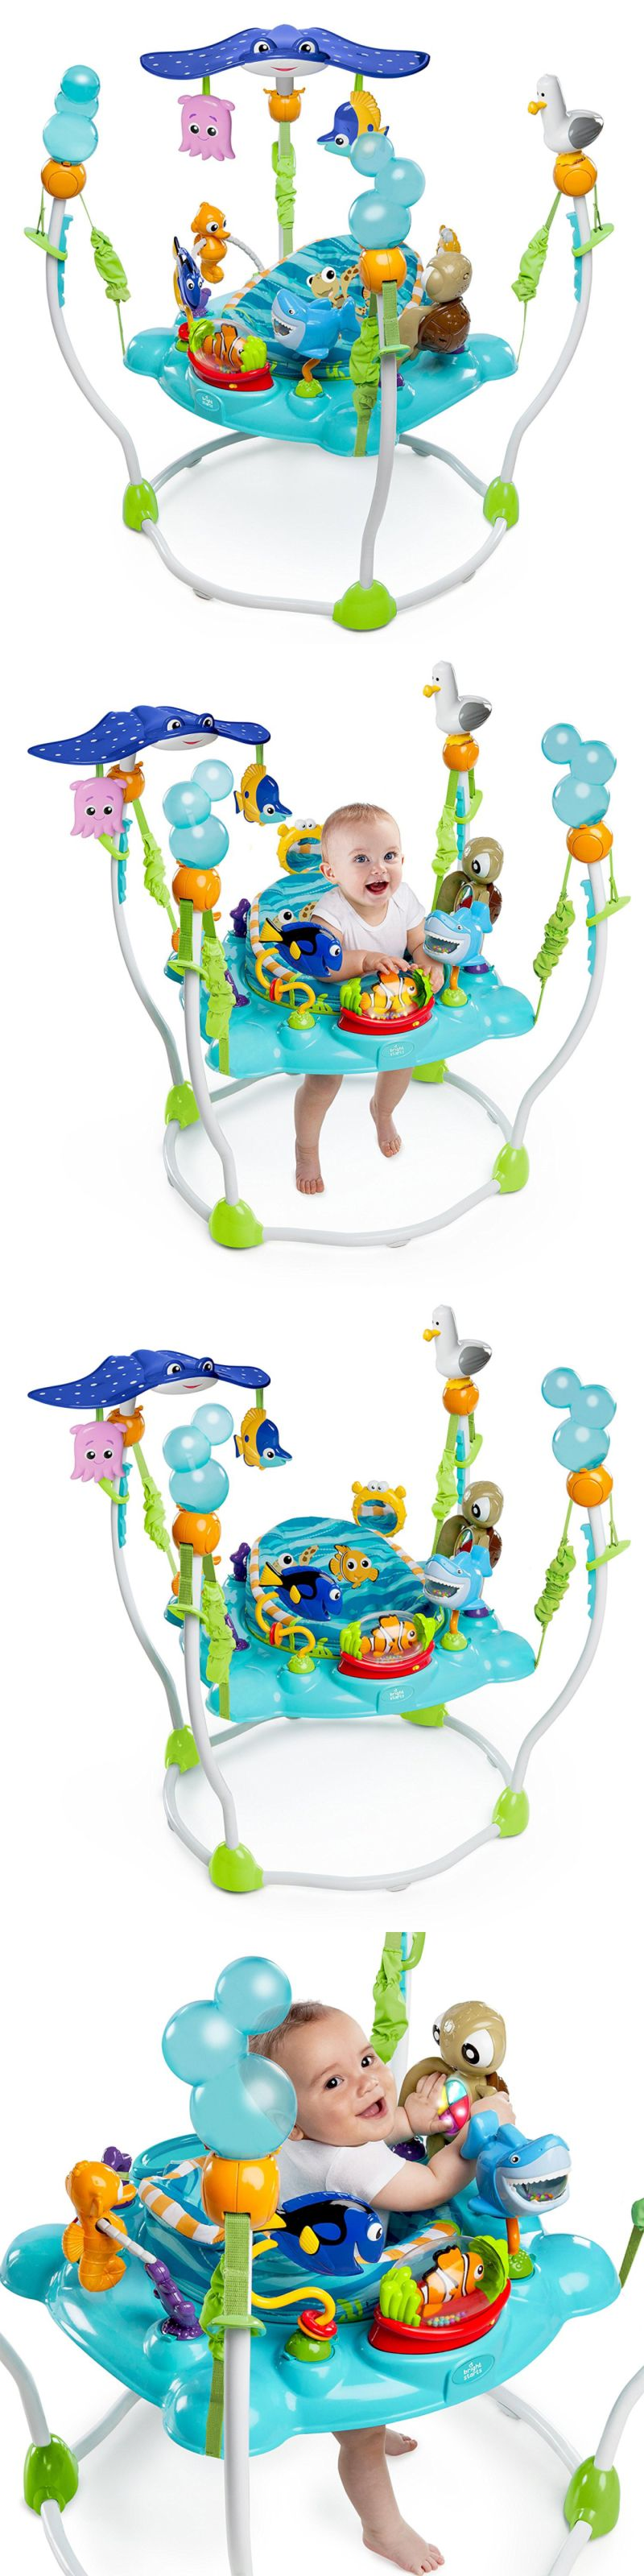 ba73c3bd2 big sale f8ba3 5a6ce baby einstein activity jumper special edition ...